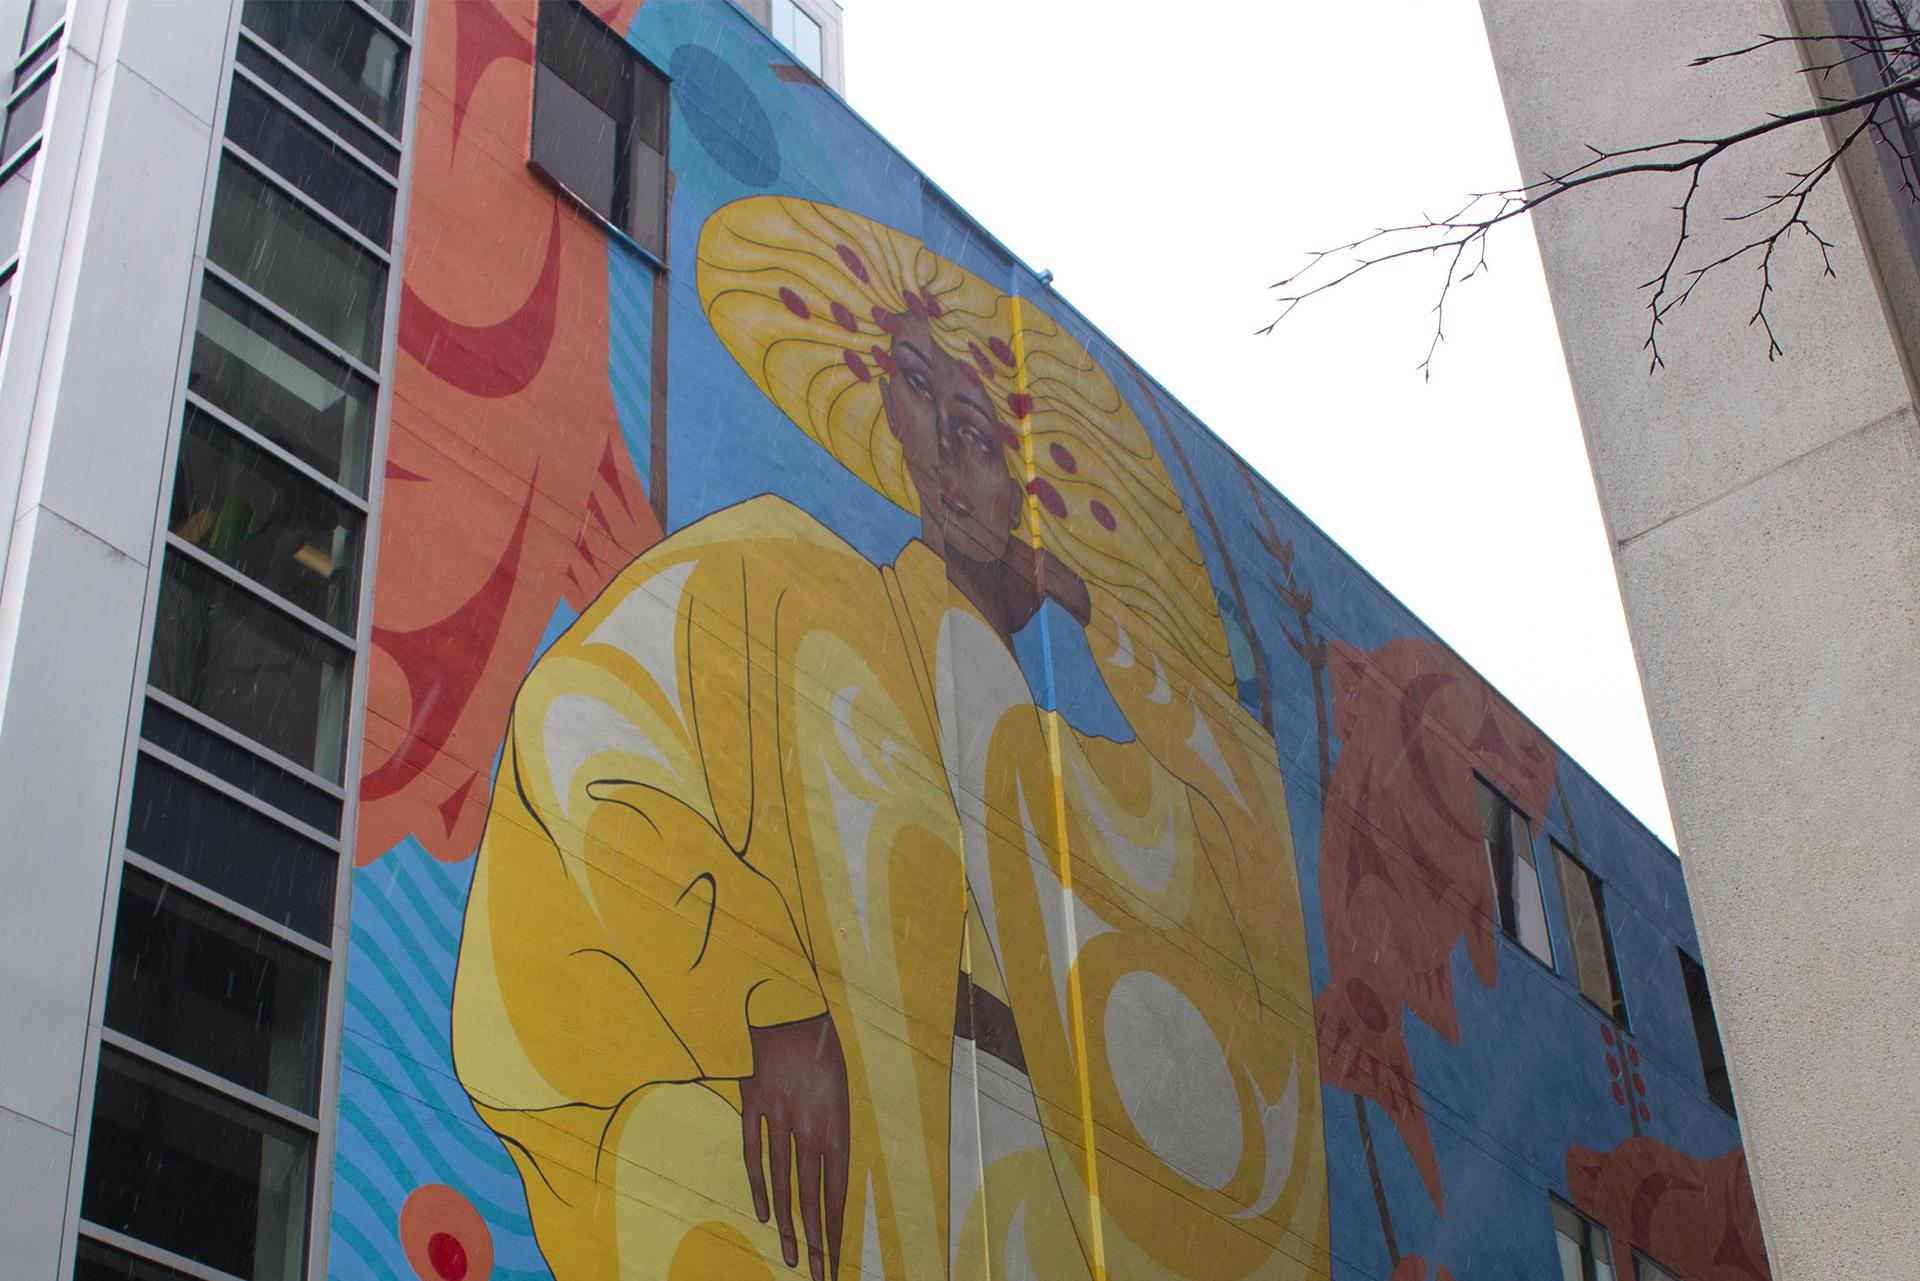 Snekwem Lane Indigenous art mural